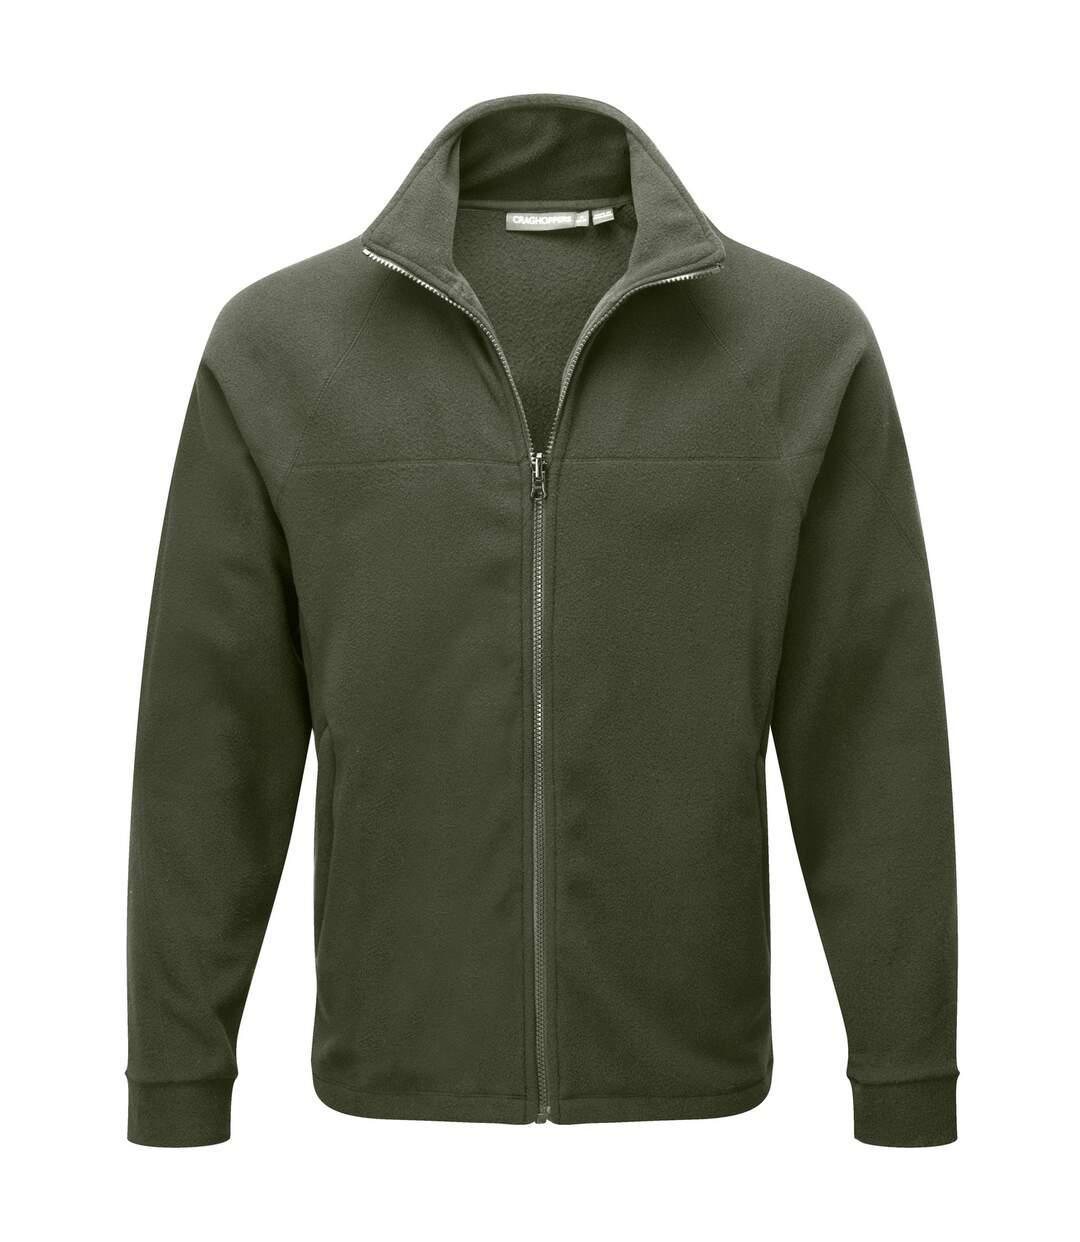 Craghoppers Mens Basecamp 200 IA Mid Weight Full Zip Fleece Jacket (Black) - UTRW365